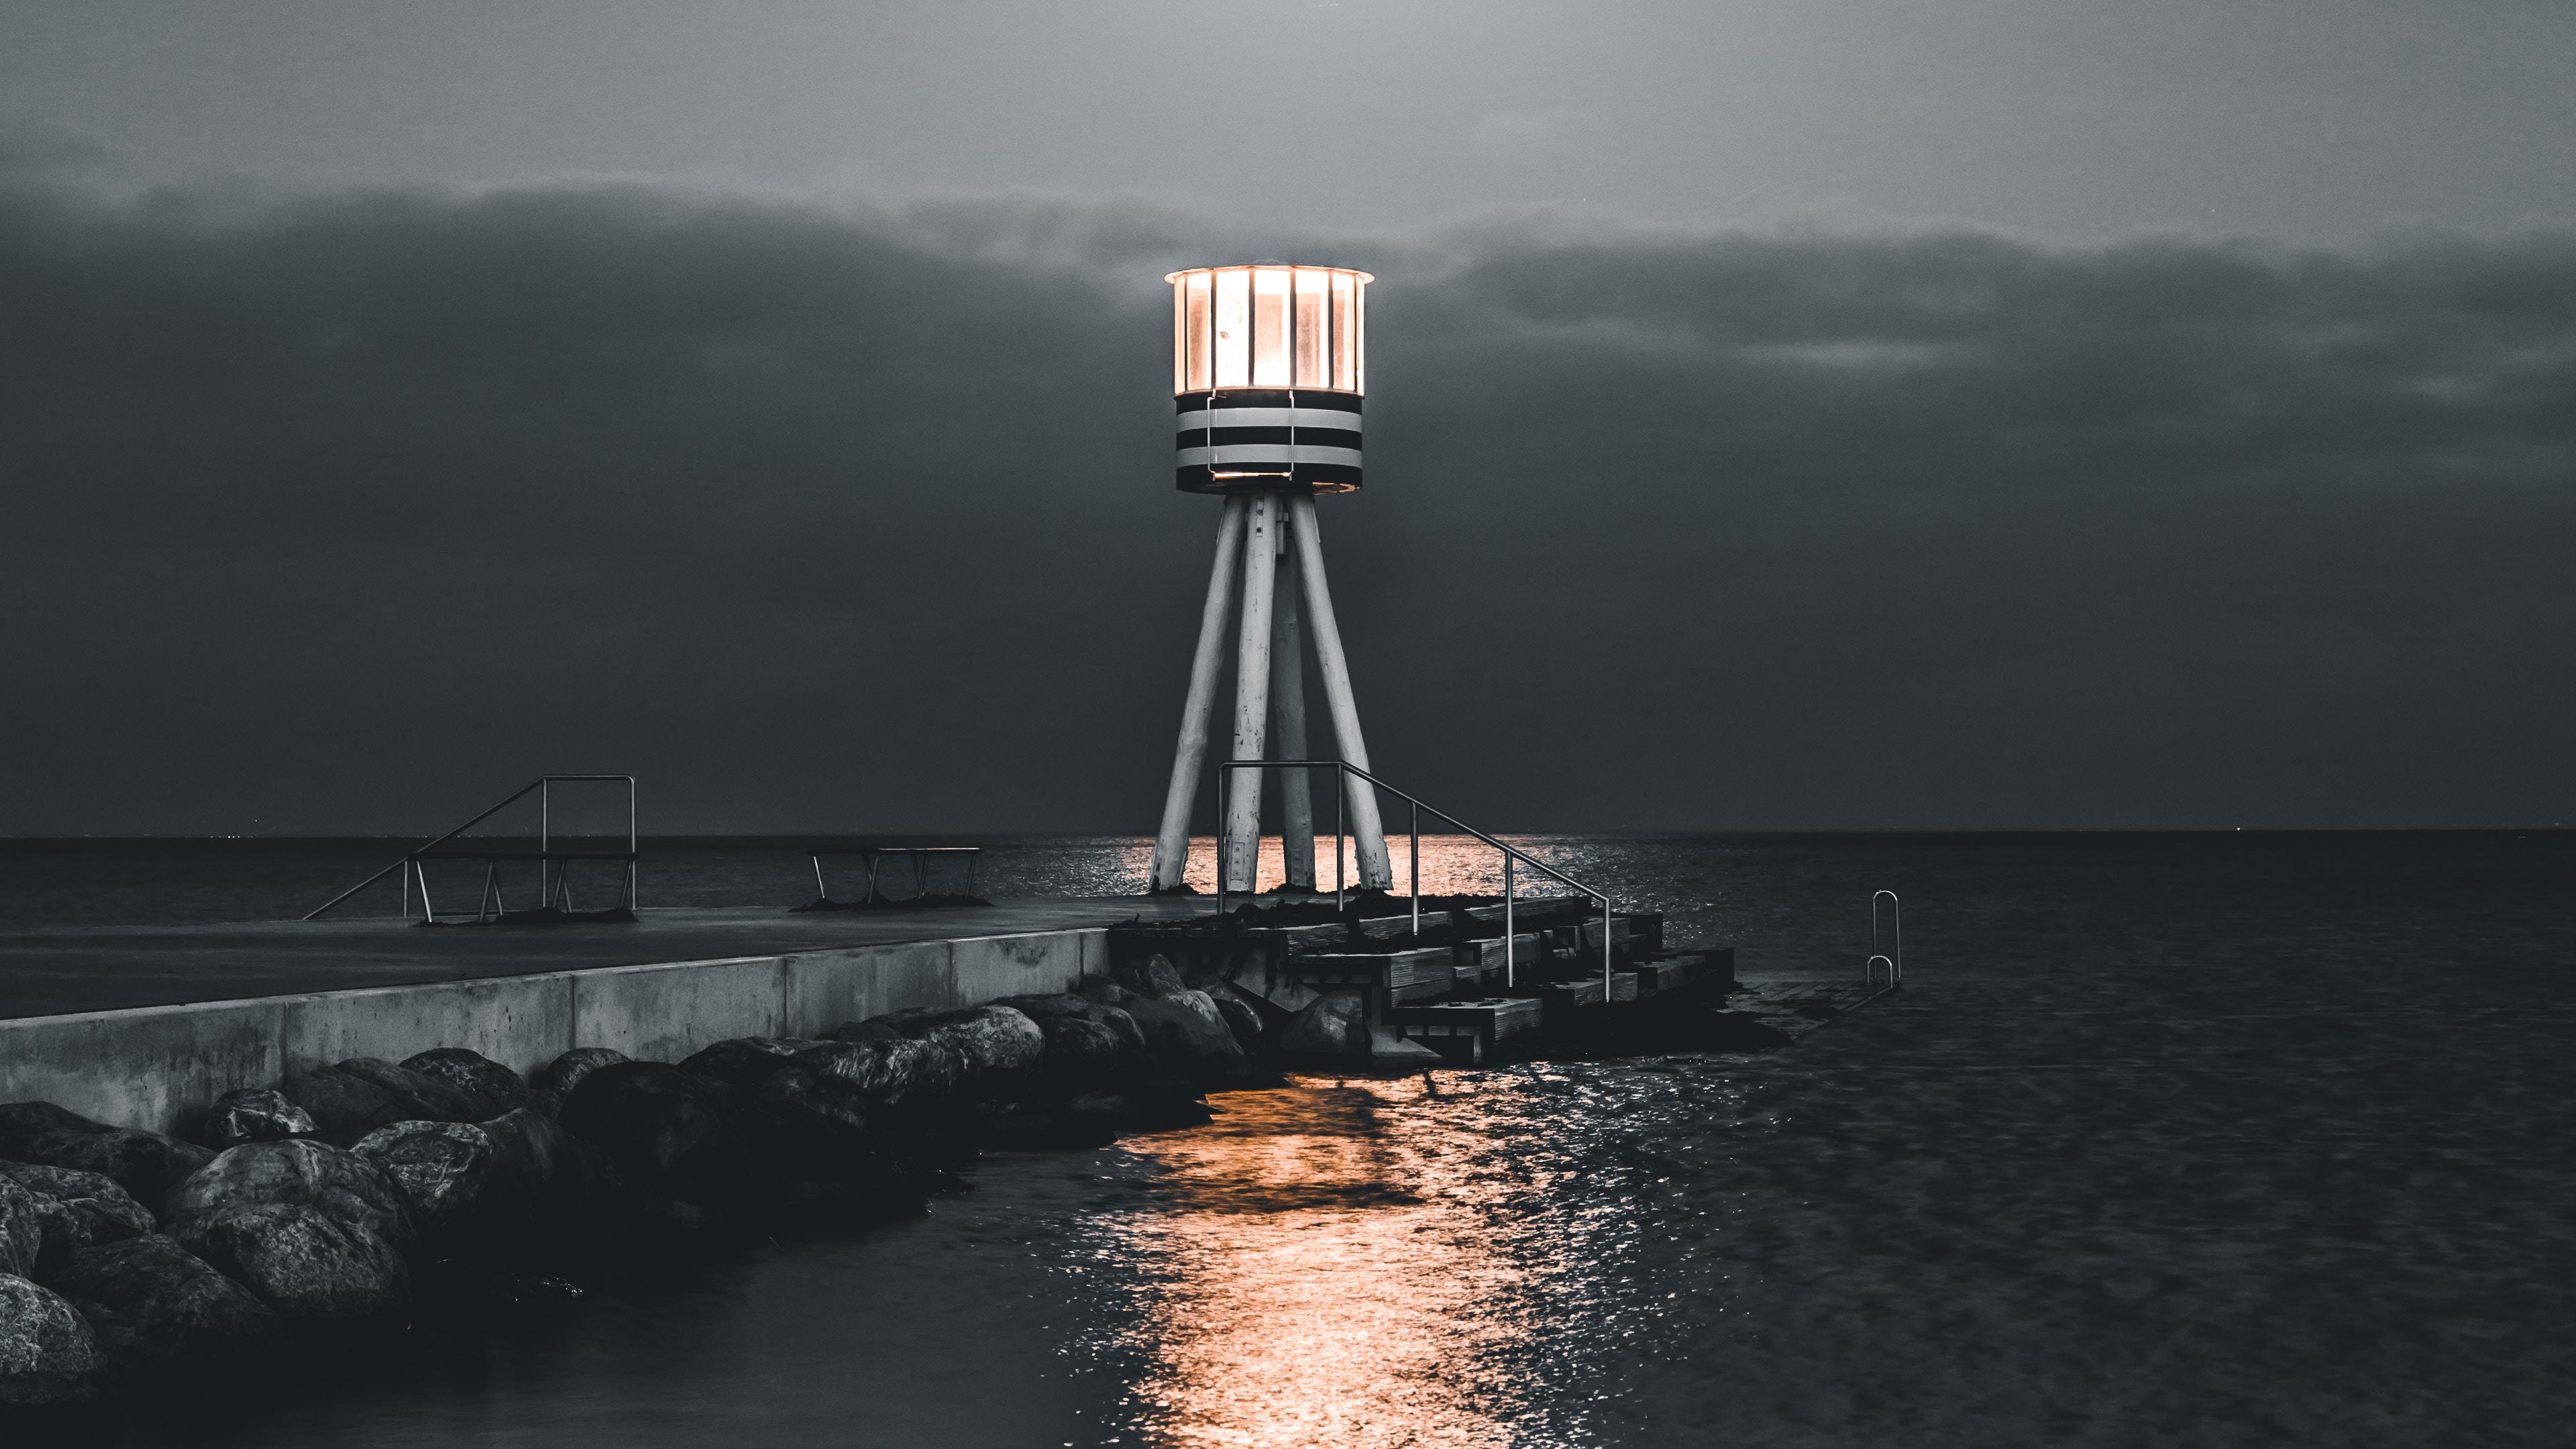 lighthouse sea pier night stones water 4k 1541116676 - lighthouse, sea, pier, night, stones, water 4k - Sea, pier, lighthouse